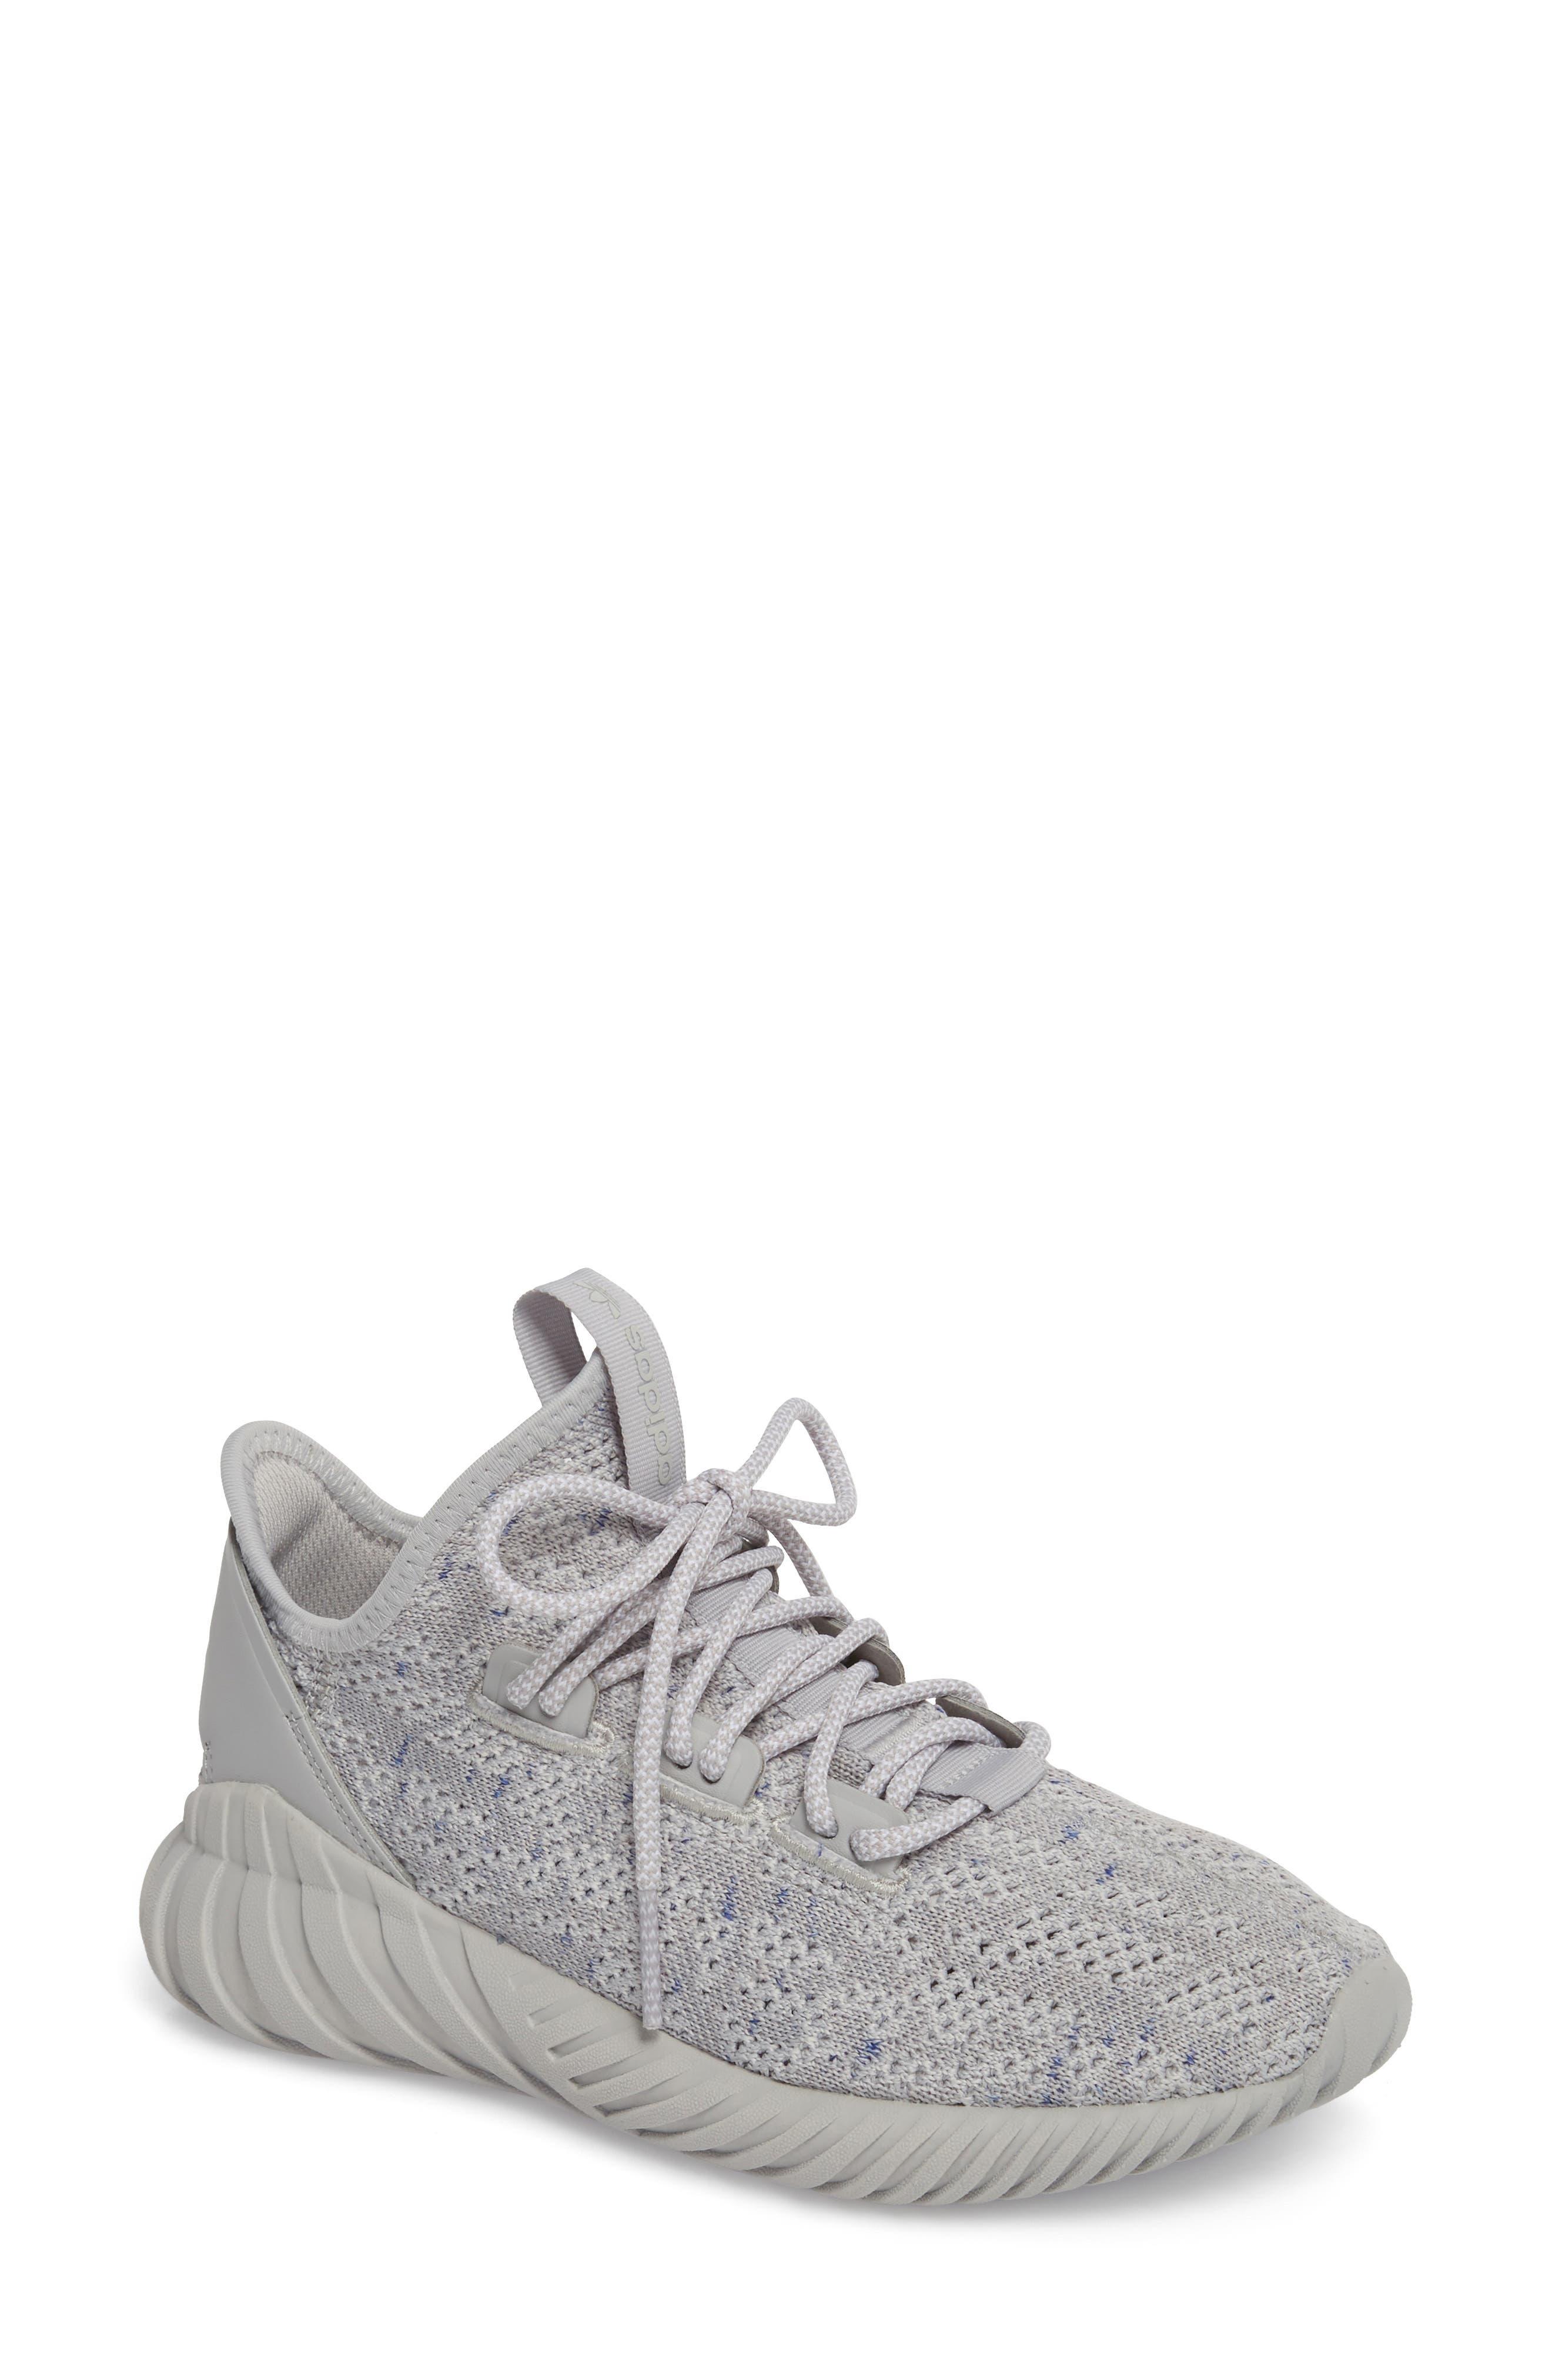 Tubular Doom Sock Primeknit Sneaker,                             Main thumbnail 1, color,                             Grey/ White/ Blue